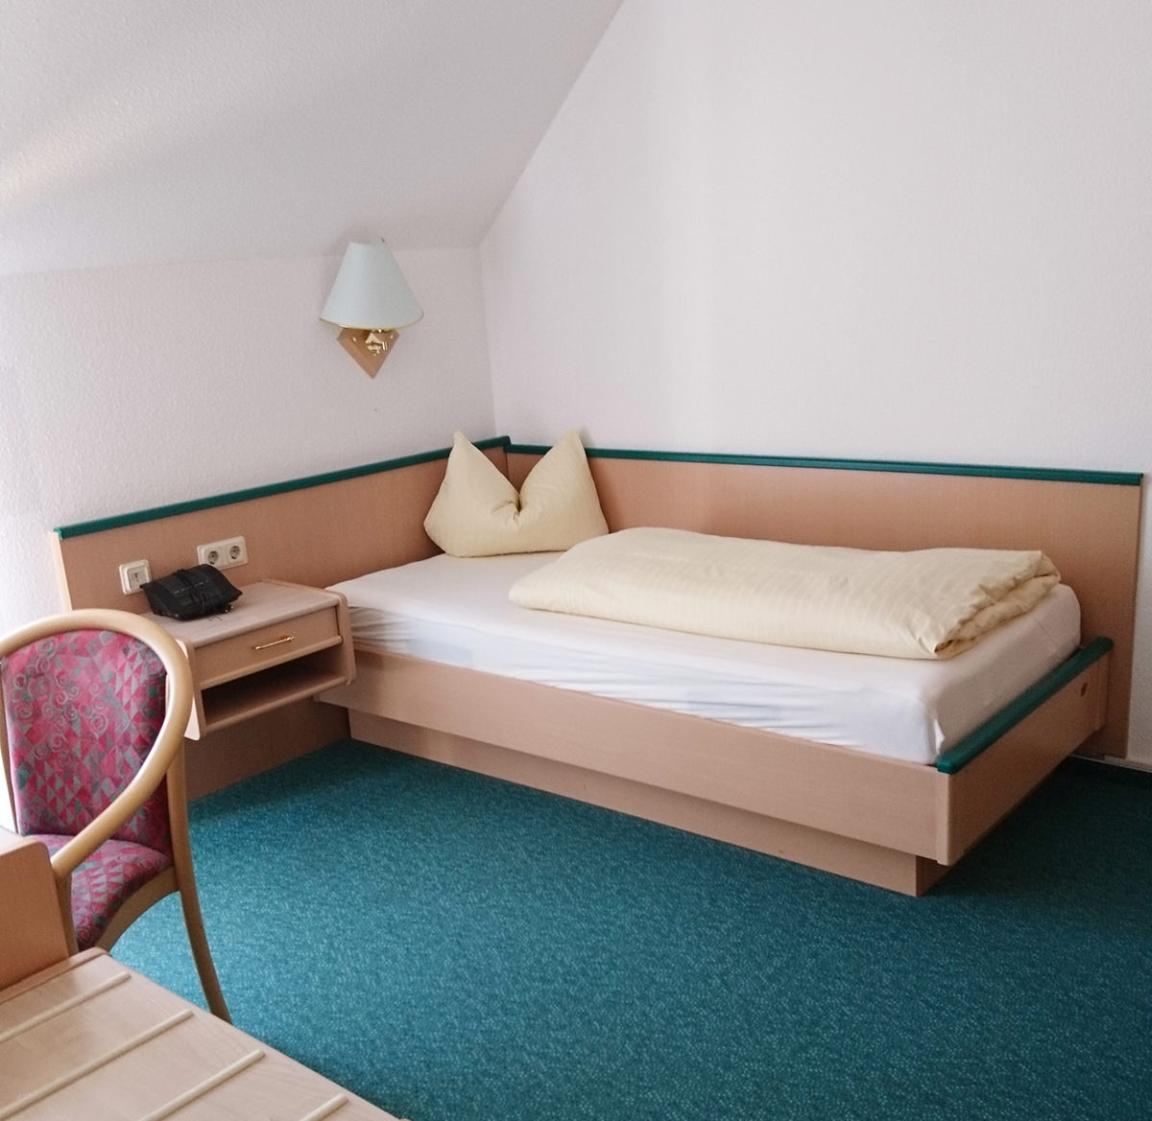 Idar-Oberstein: Hotel-Cafe Rieth